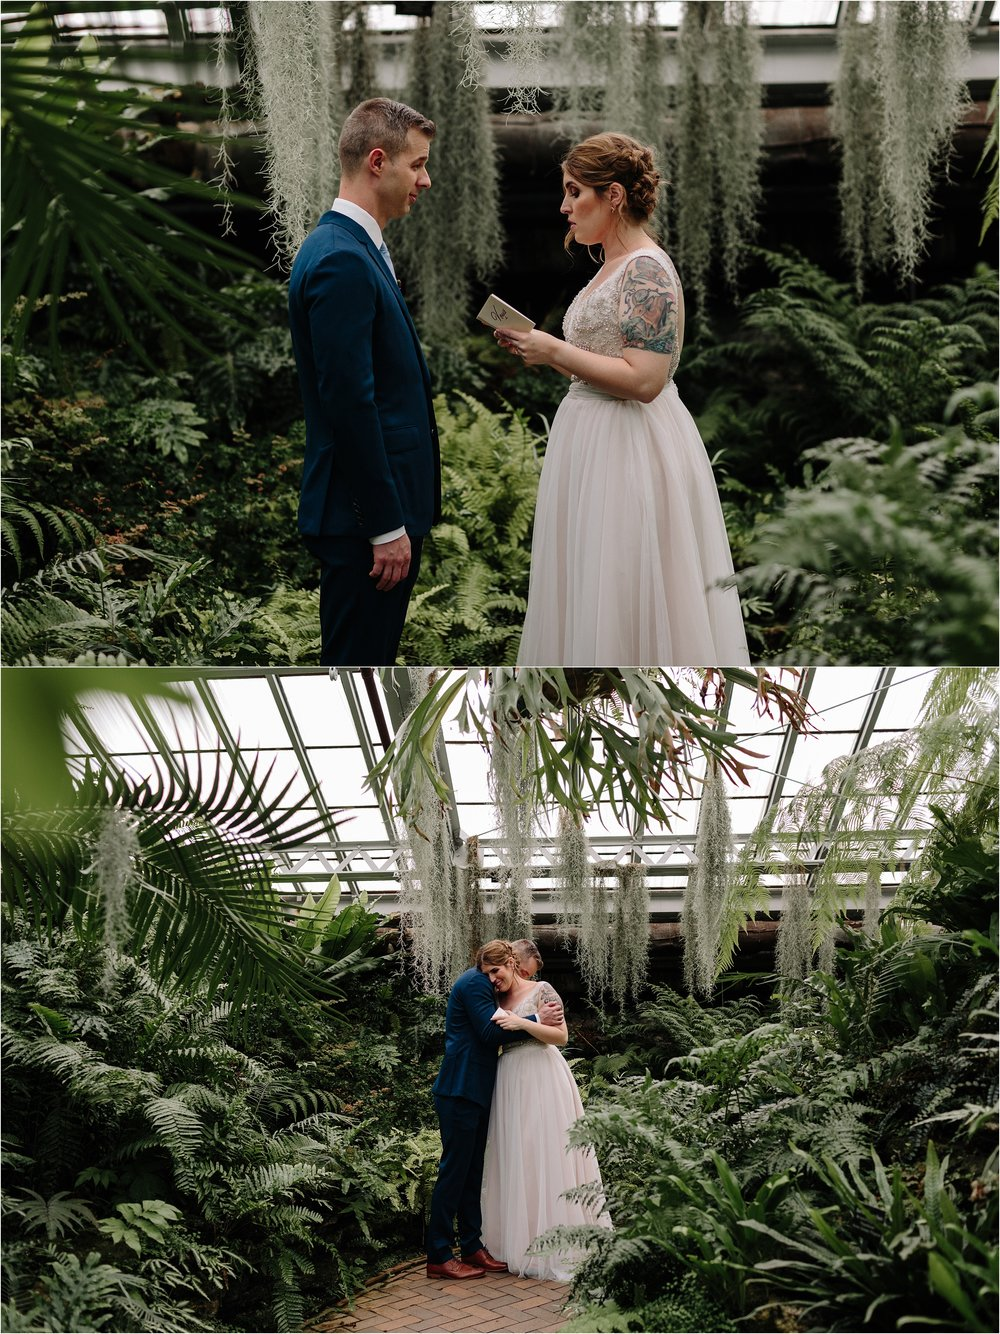 garfield-park-conservatory-wedding-99.jpg